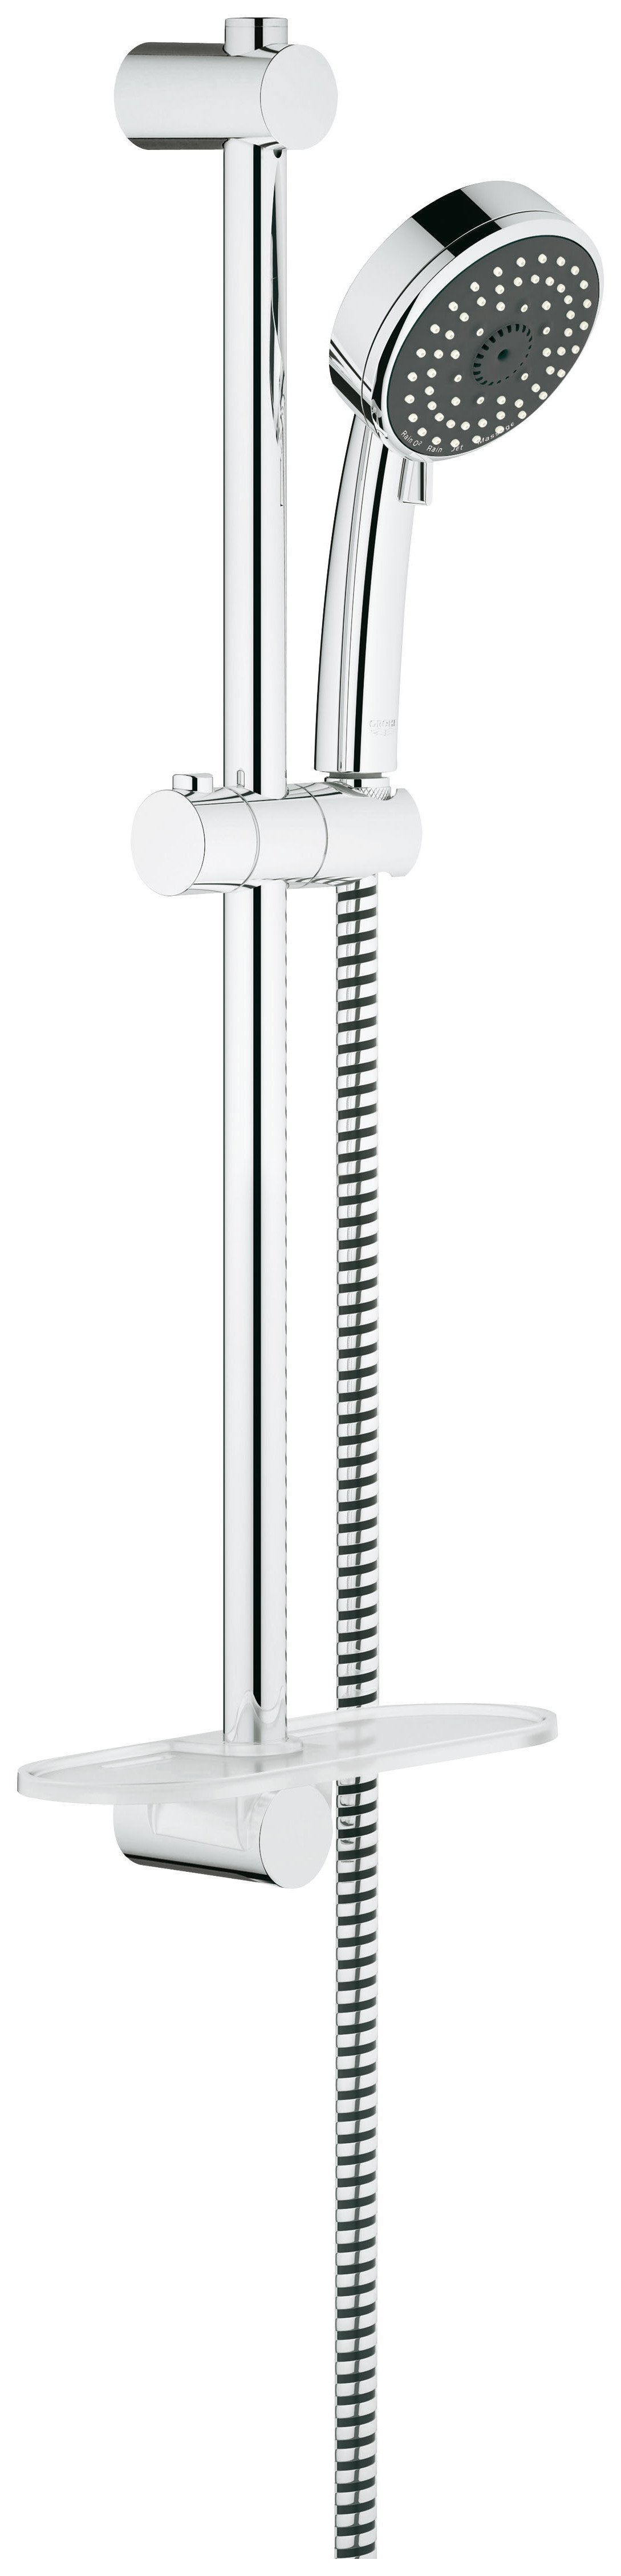 Grohe Vitalio Comfort 100 Metal Hand Shower Rail Set